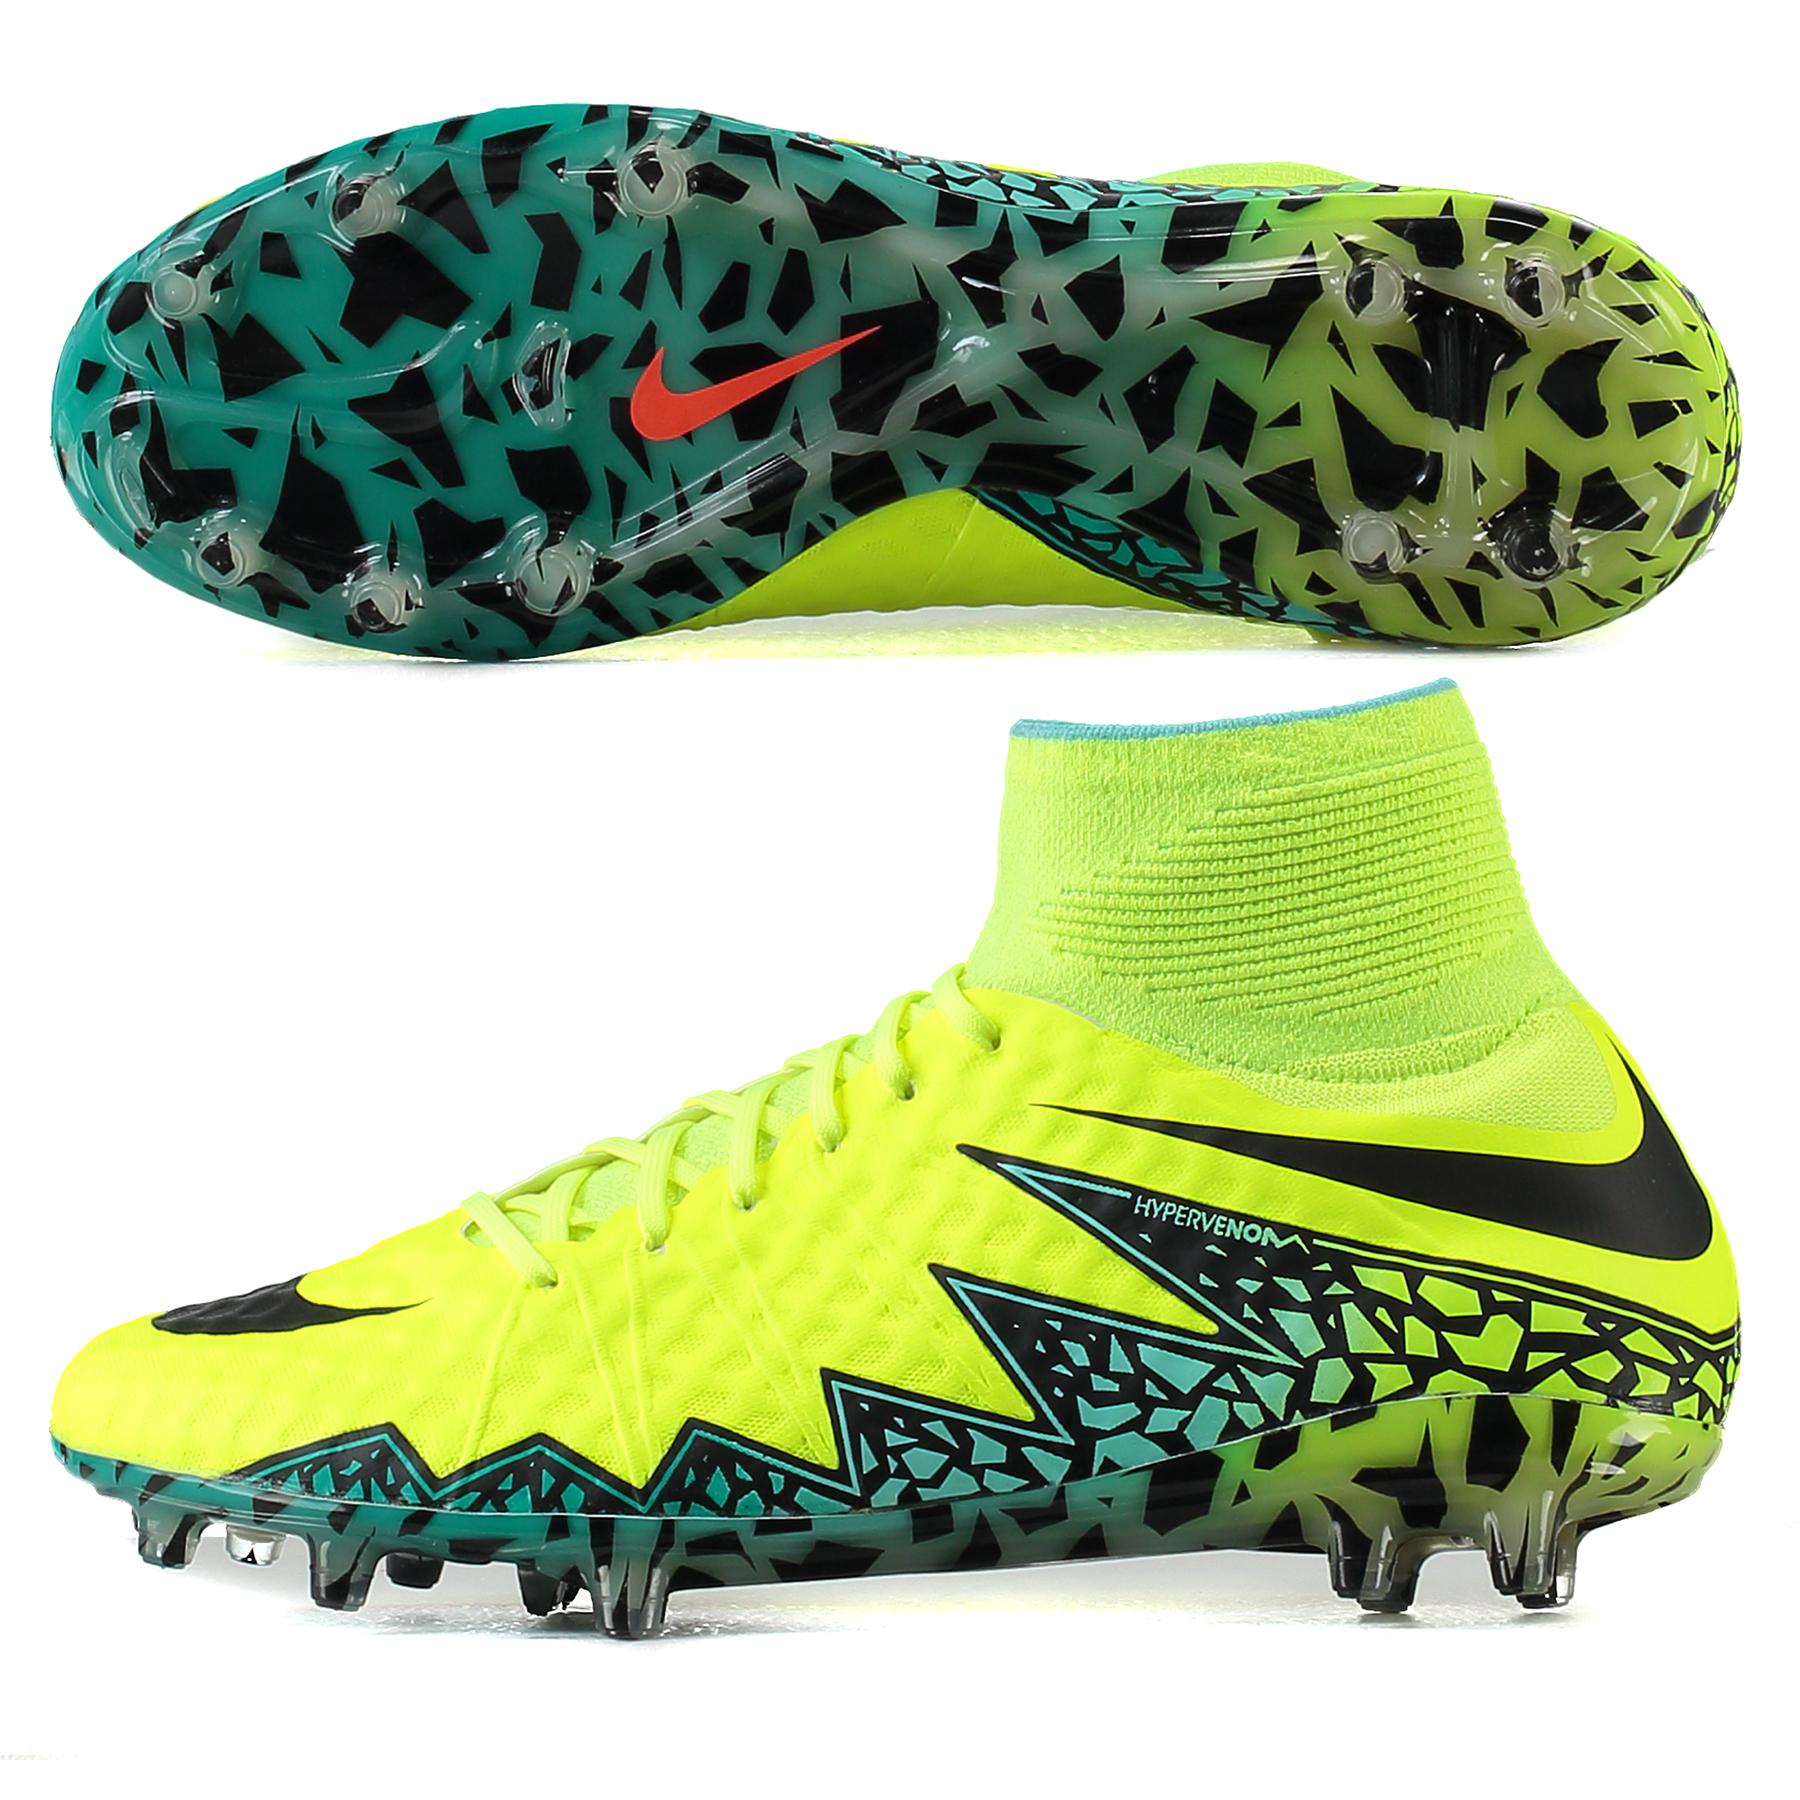 bf3114386 Nike Hypervenom Phantom II Spark Brilliance FG Football Boots Yellow Image